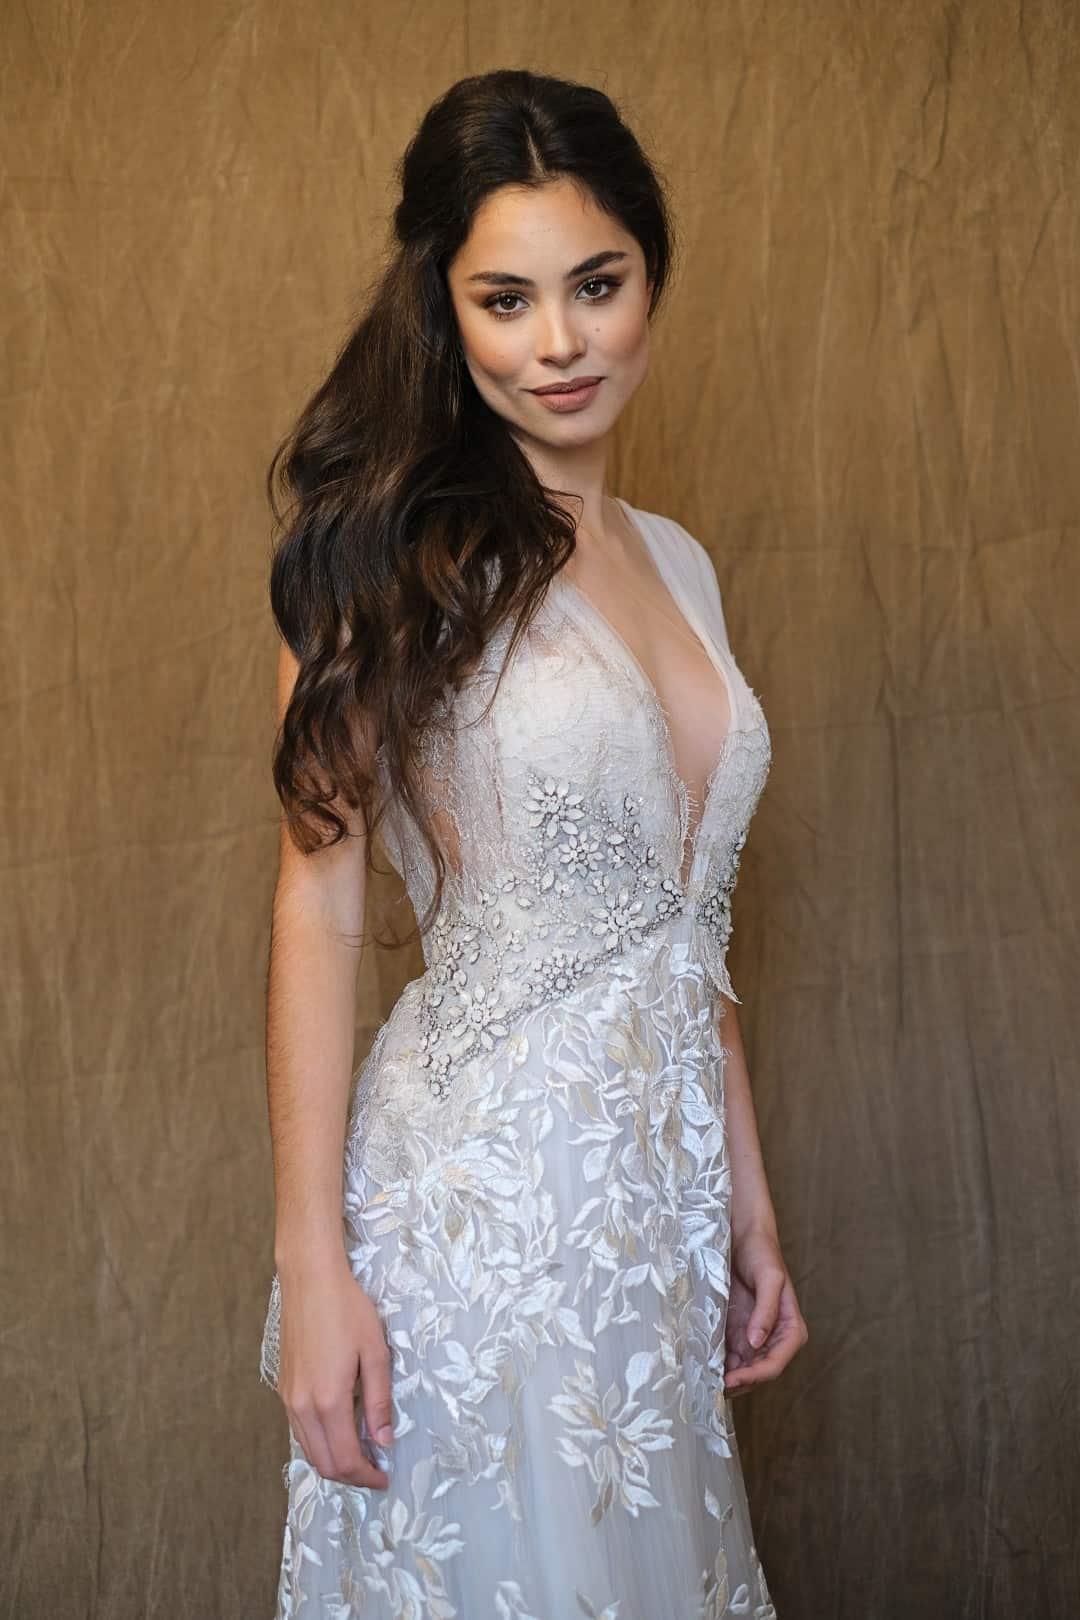 Jemné a romantické svadobné šaty - Marco&Maria - 2017-1017- front_top